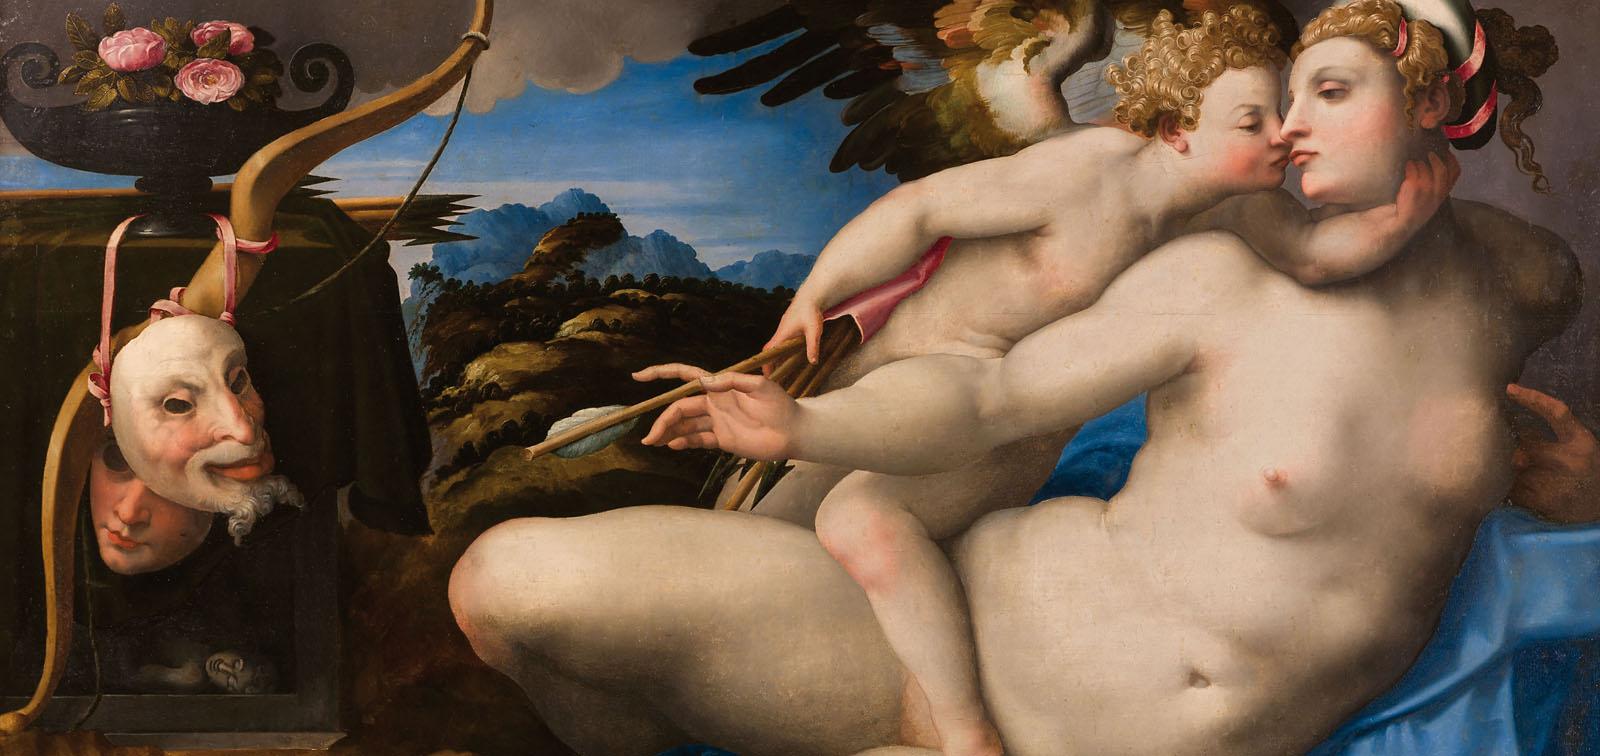 Mythological Passions: Tiziano, Veronese, Allori, Rubens, Ribera, Poussin, Van Dyck, Velázquez